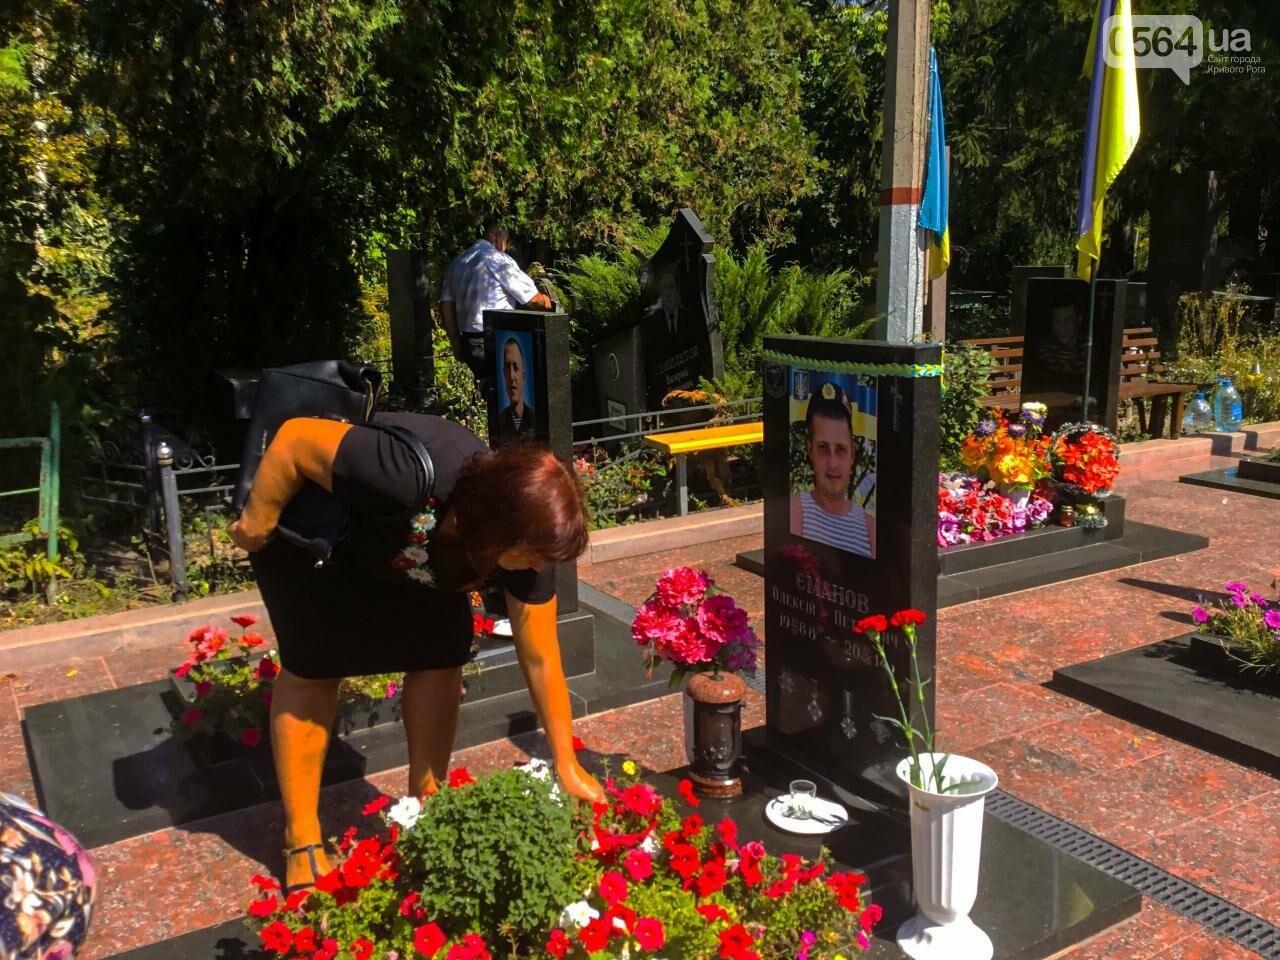 На Аллее Героев провели панихиду по погибшим в зоне АТО криворожанам, - ФОТО , фото-14